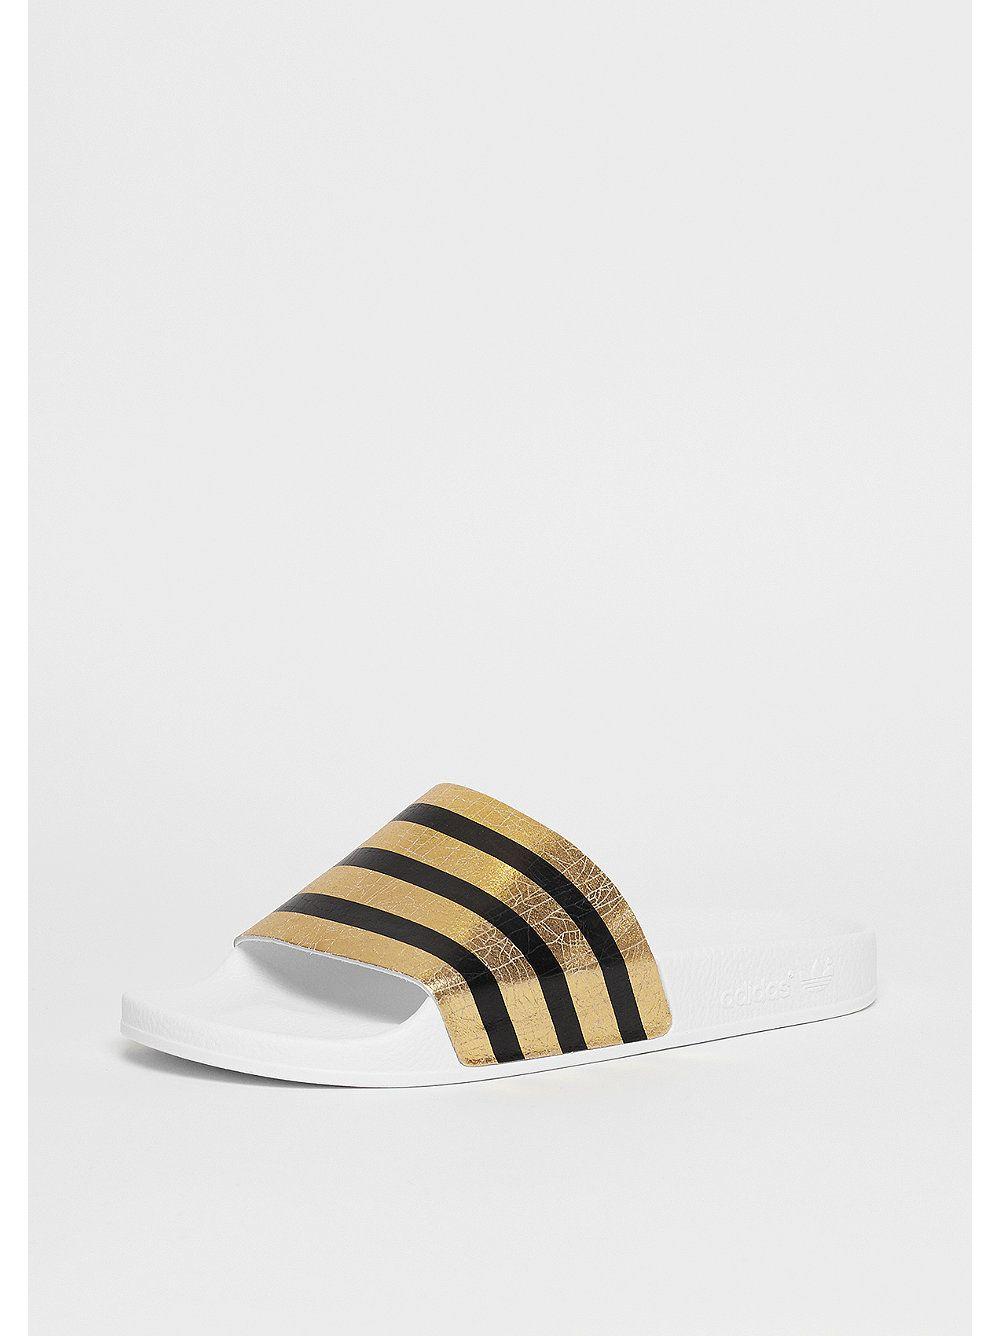 adidas Badeschlappe Adilette gold metallic